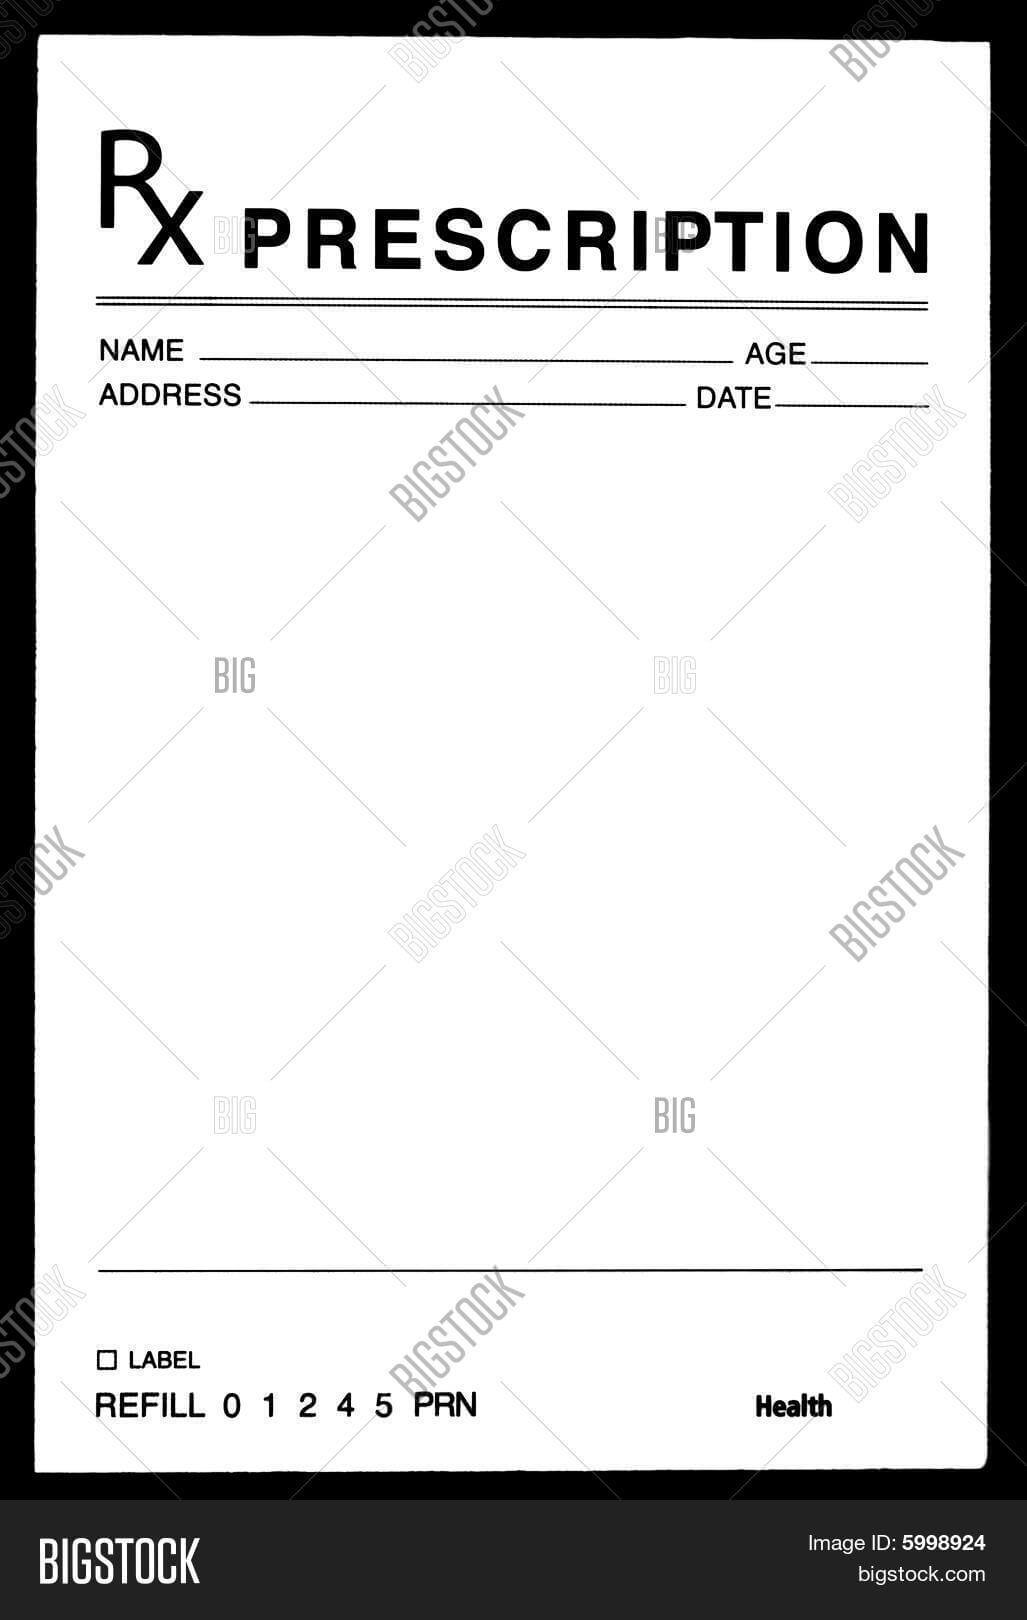 26 Images Of Blank Prescription Form Doctor Template Inside Blank Prescription Form Template